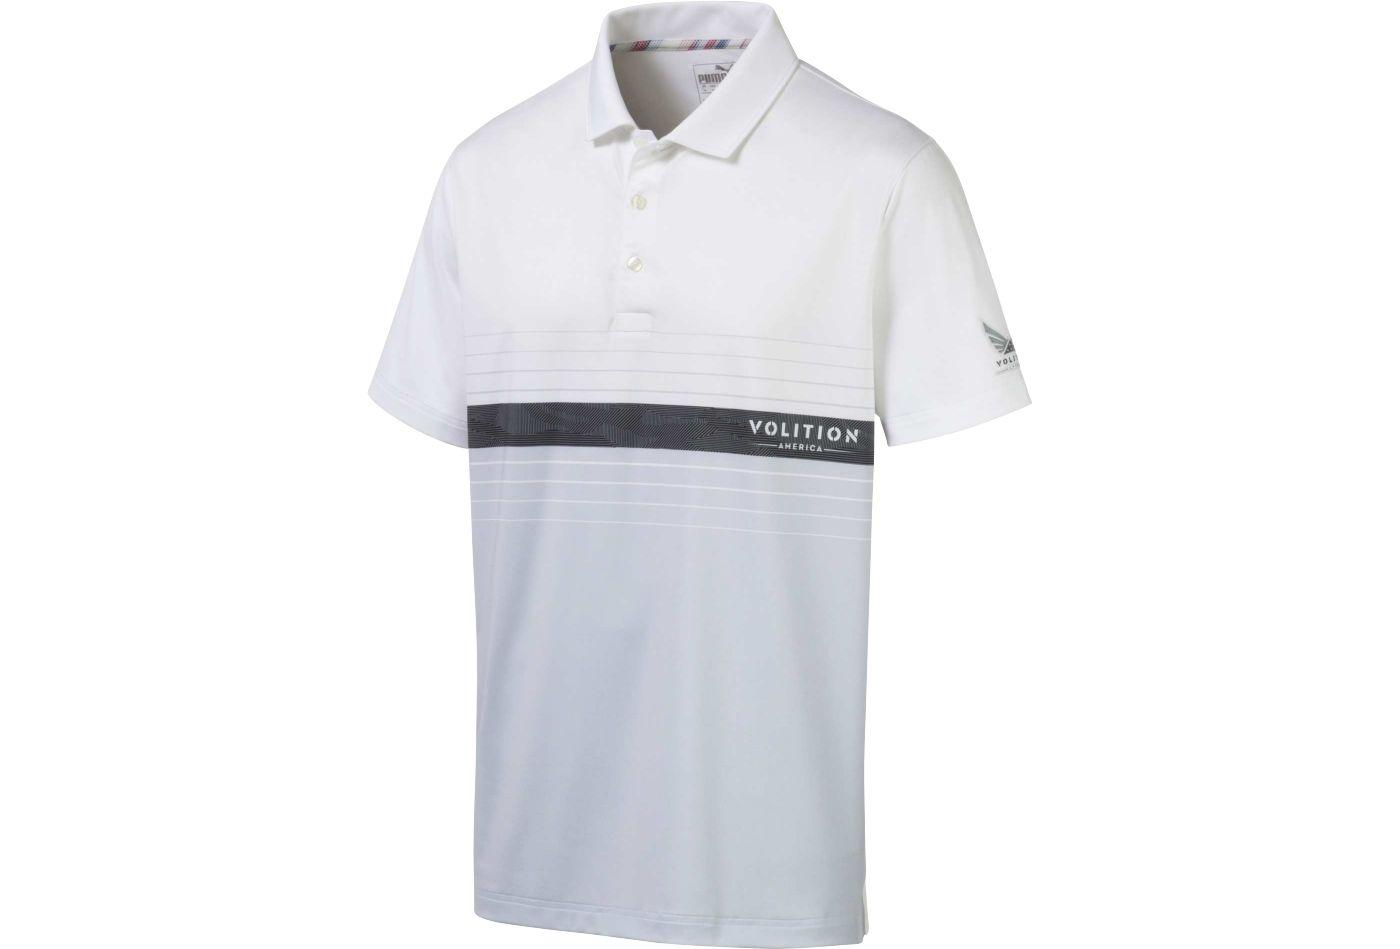 PUMA Men's Volition Horizon Golf Polo